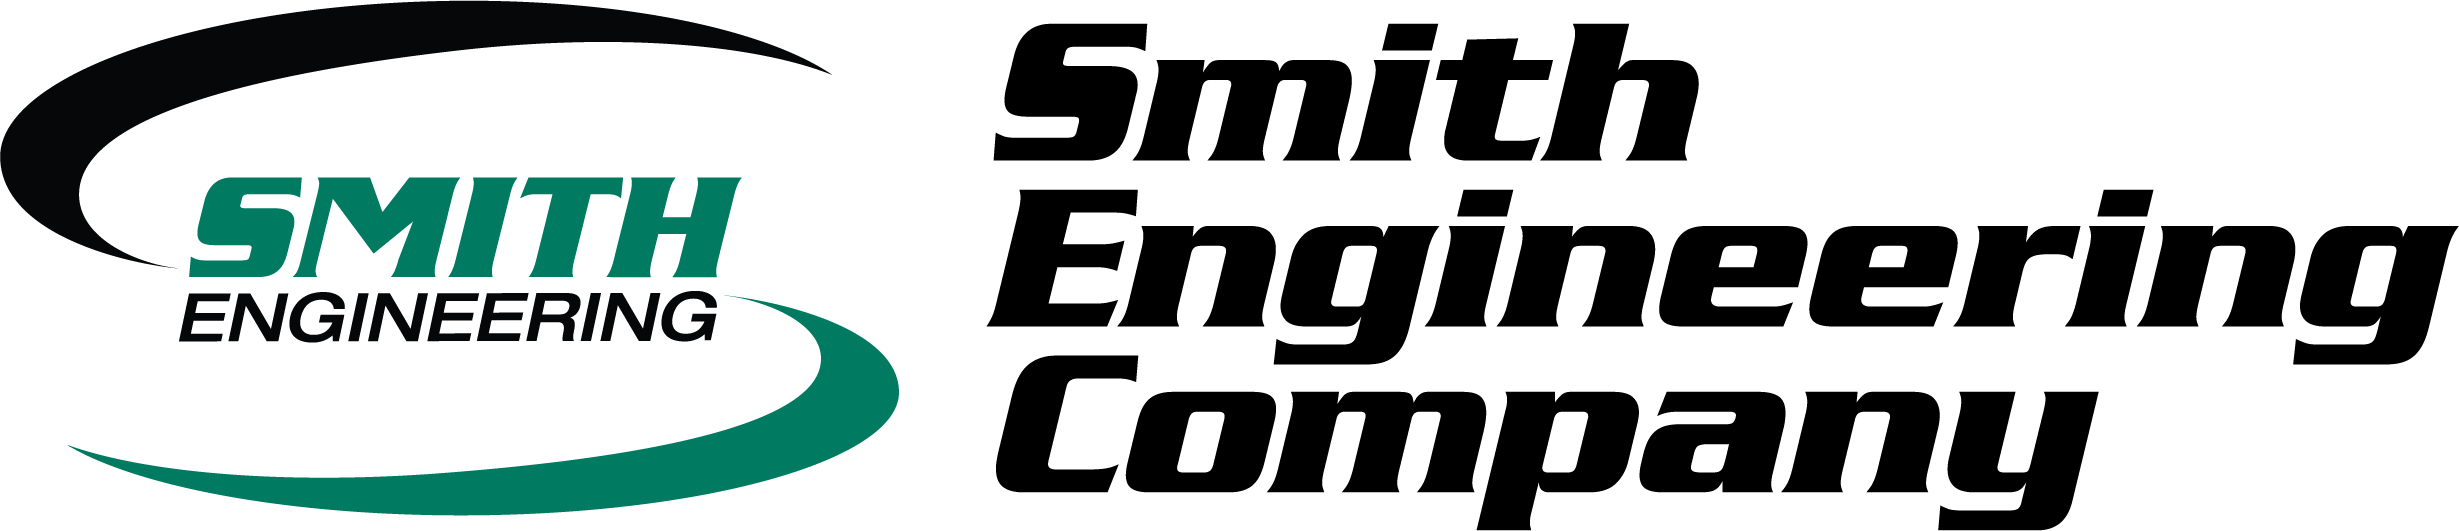 Smith Engineering logo